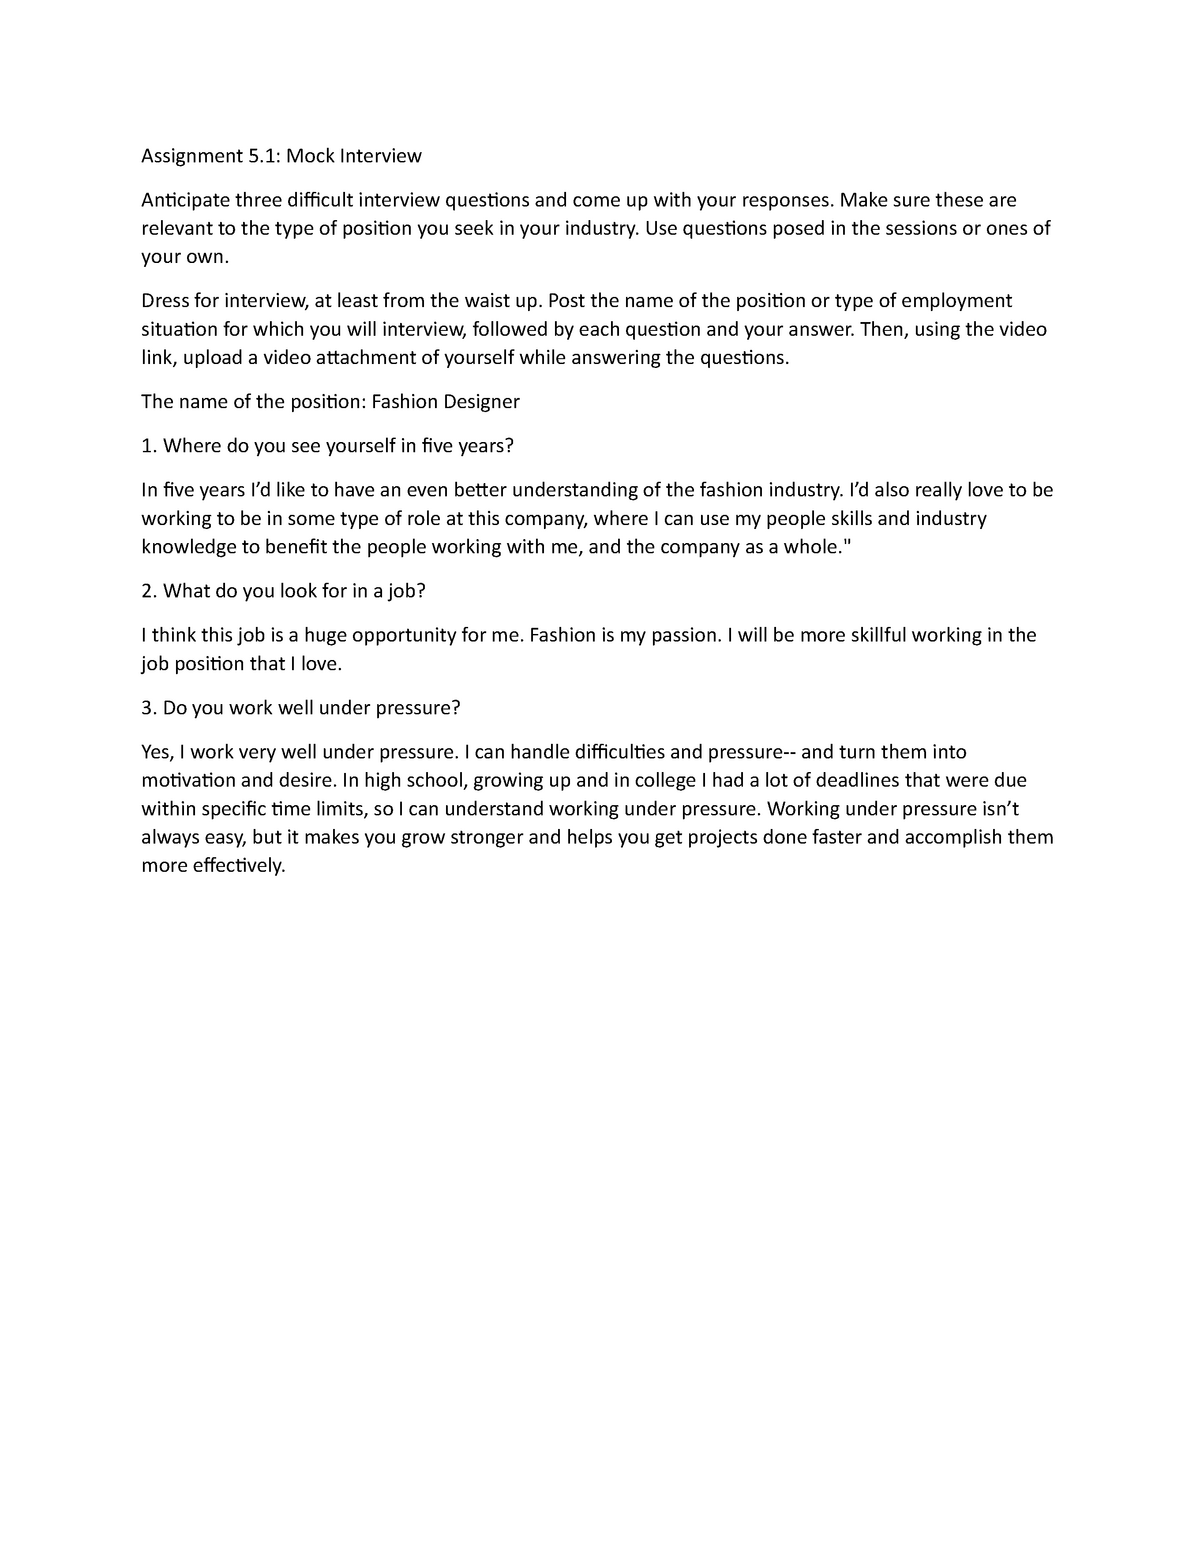 Assignment 5 1 Mock Interview - LA 291: Designing Careers